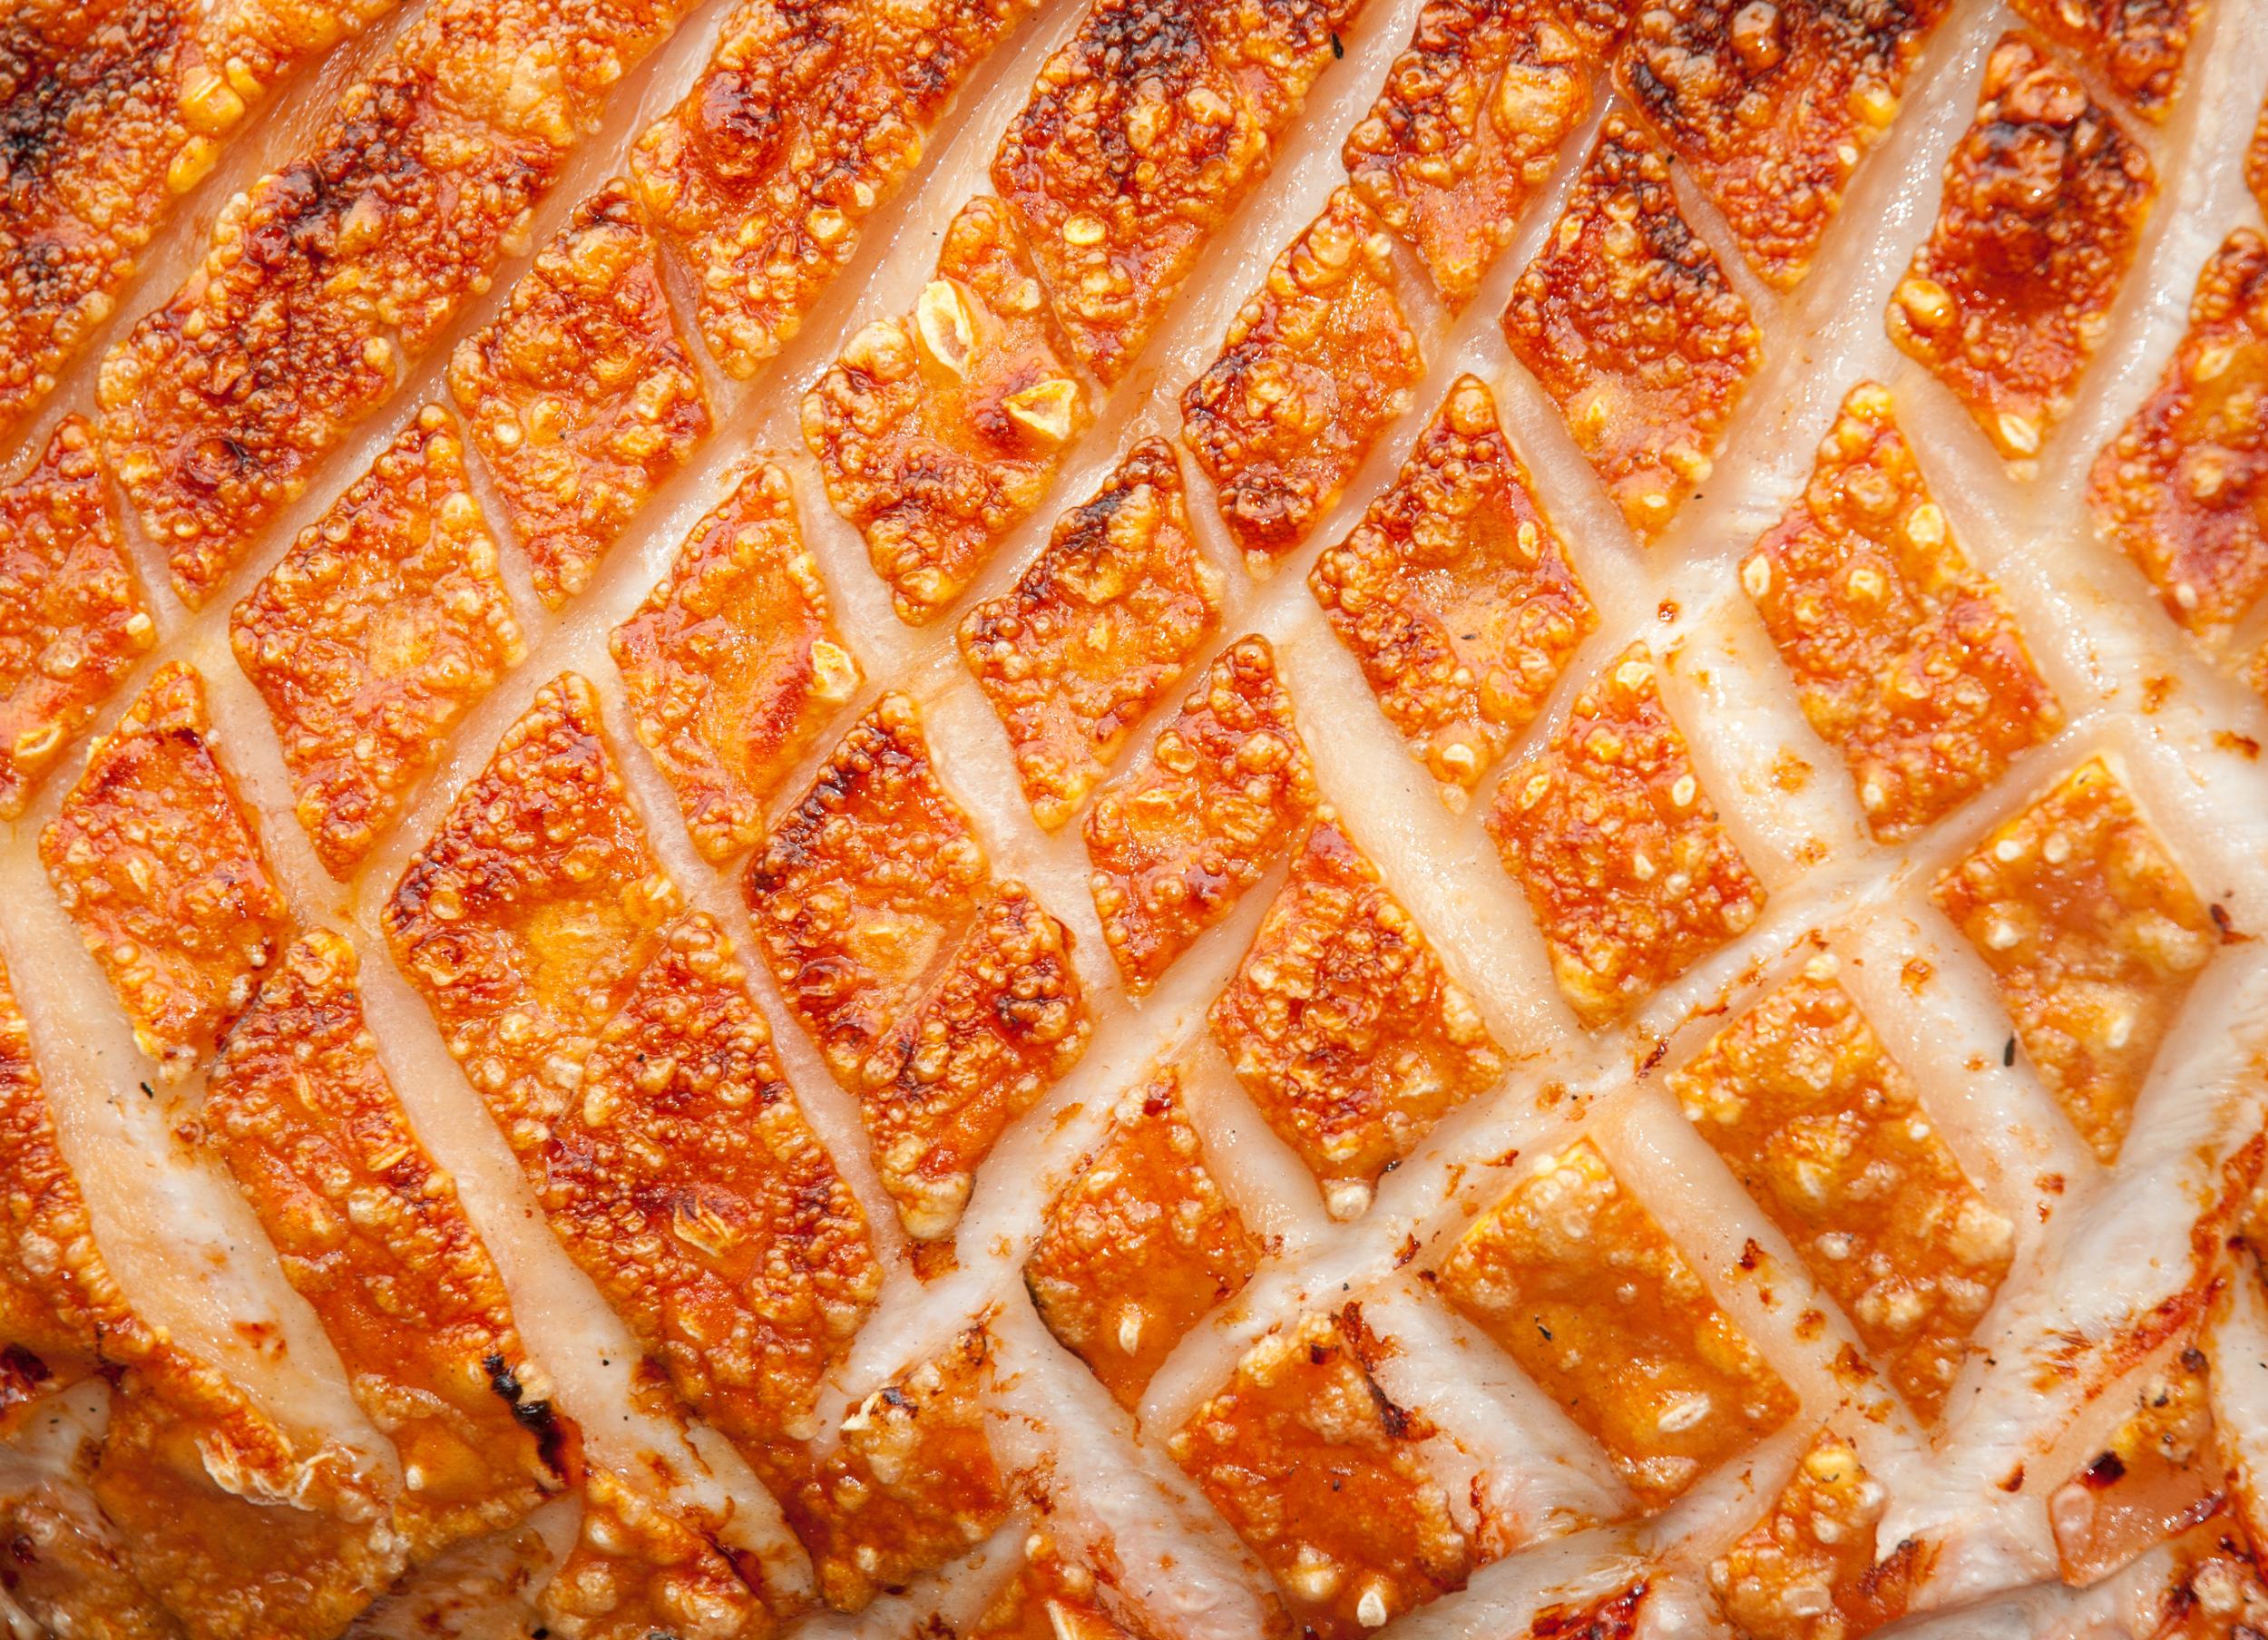 bigstock-Pork-Crackling-20573750.jpg